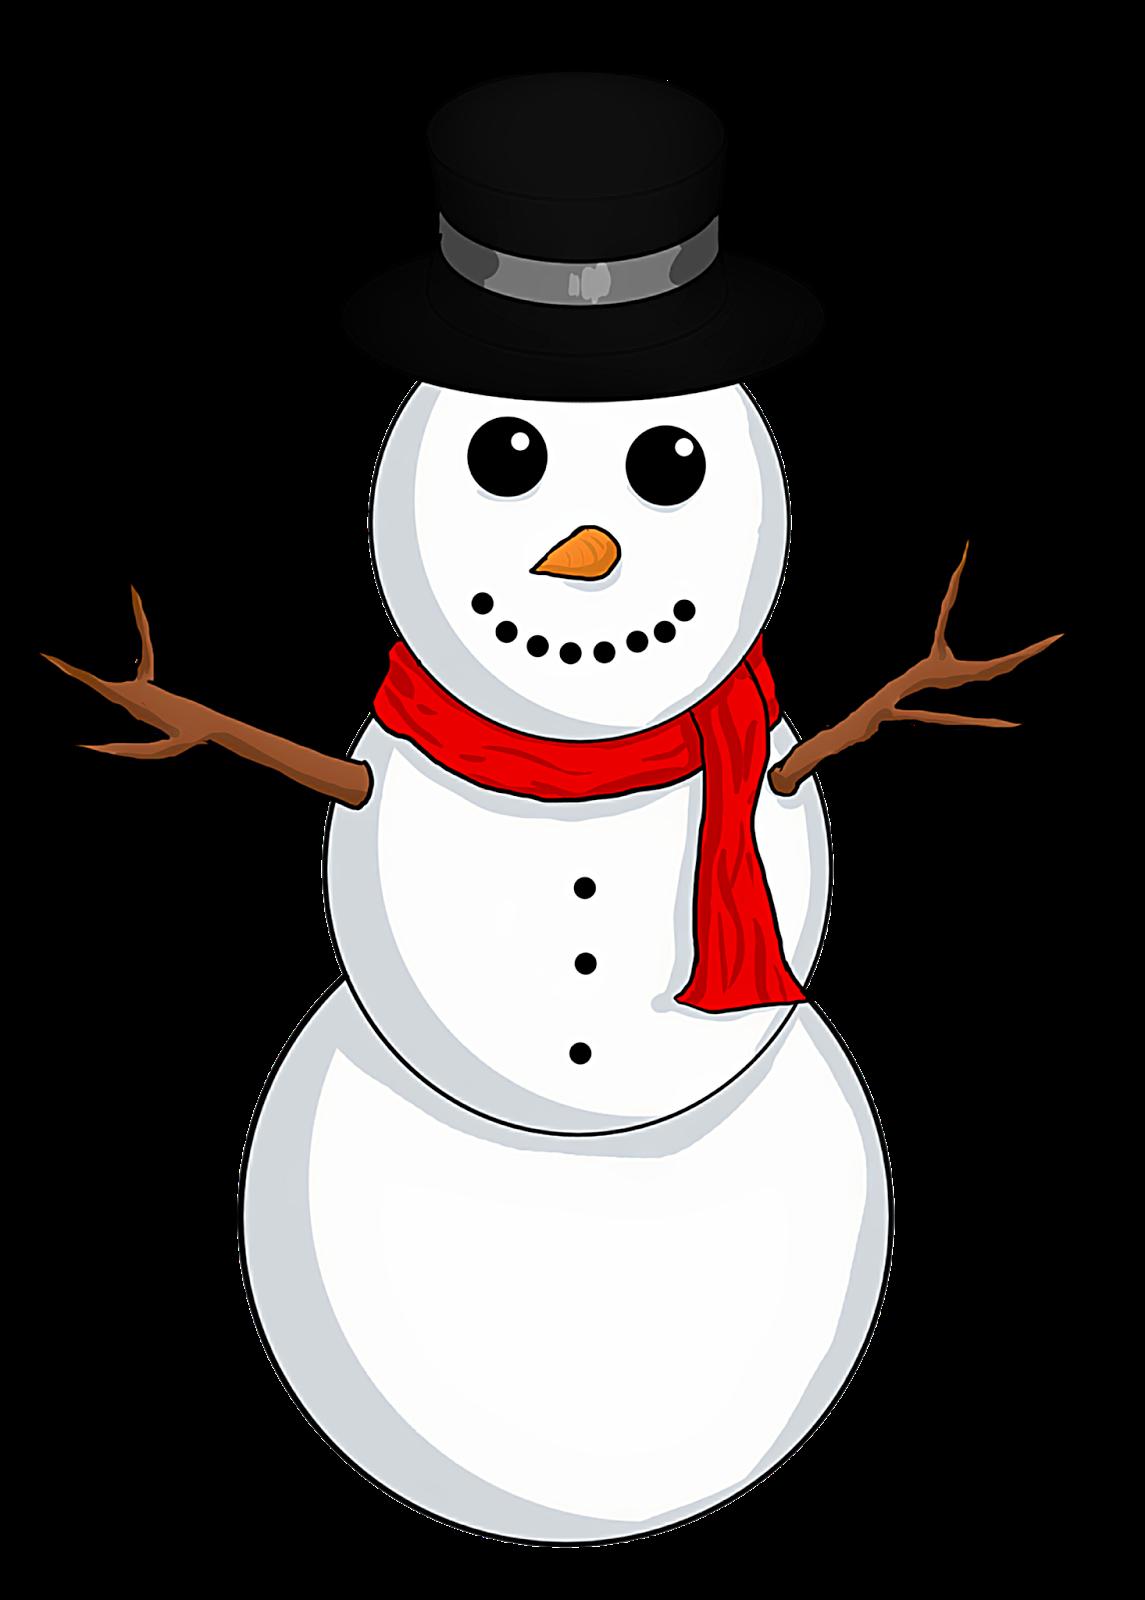 1145x1600 Christmas Snowman Clipart 4